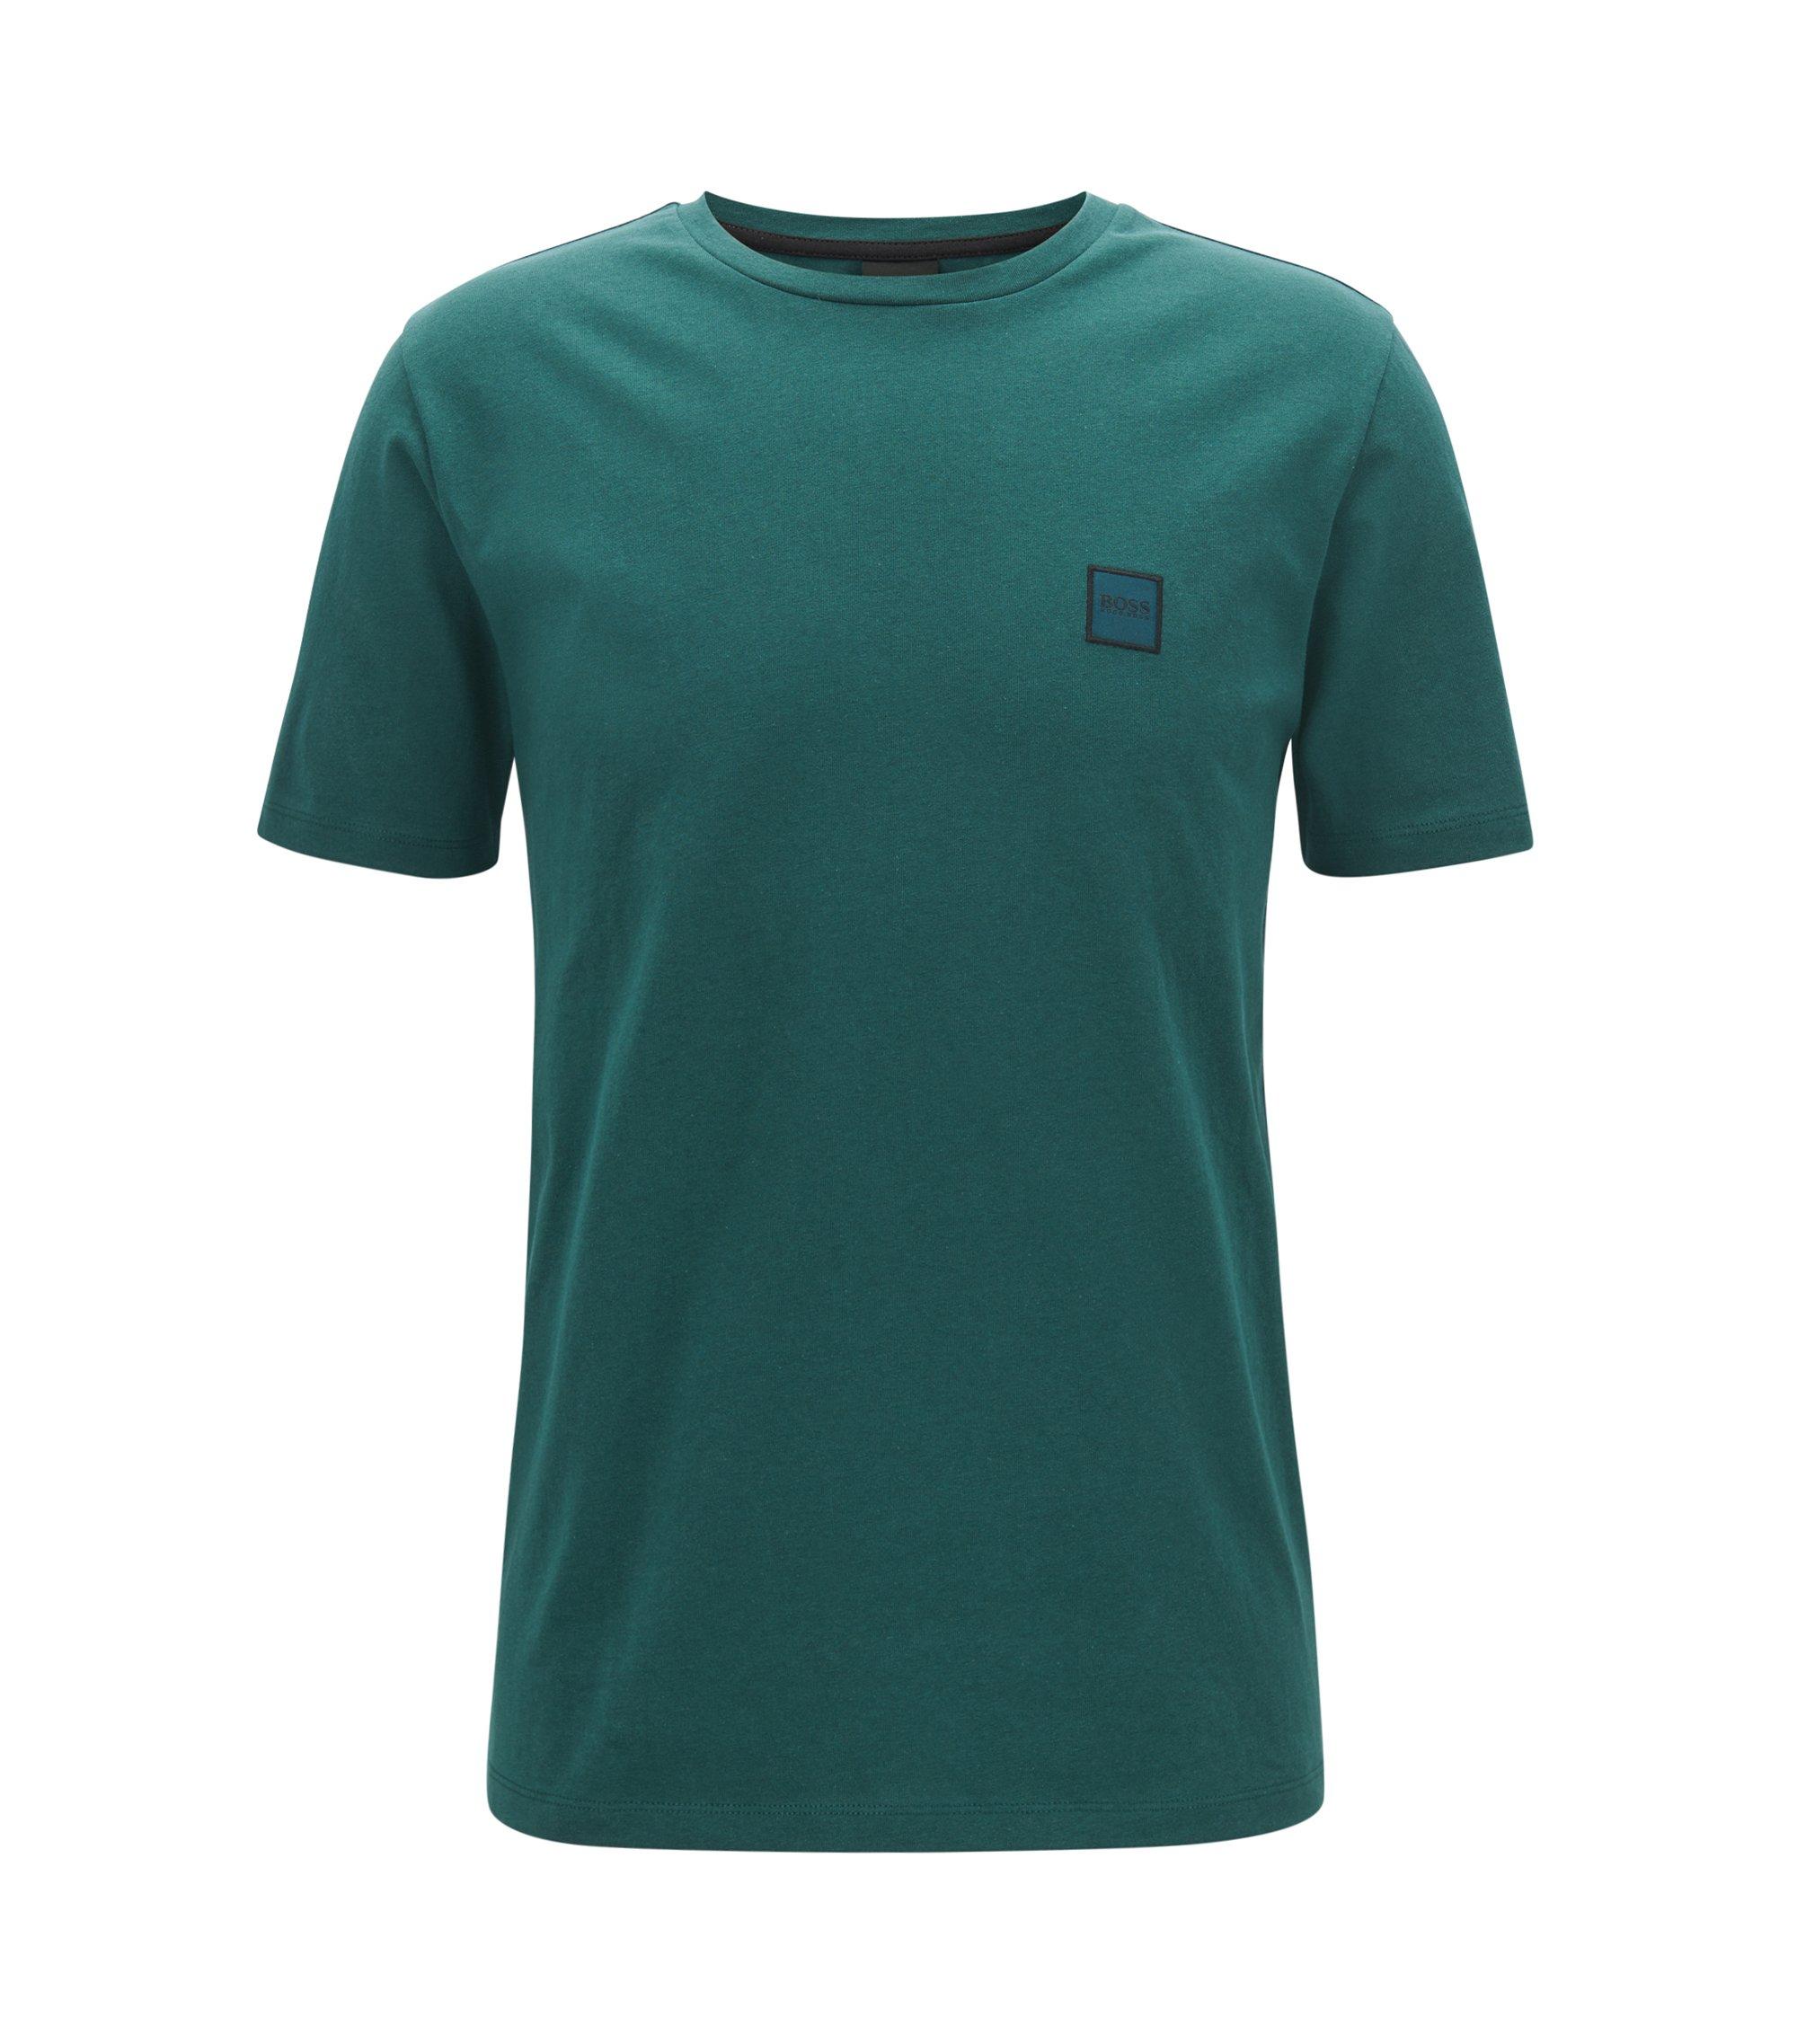 Crew-neck T-shirt in single-jersey cotton, Dark Green